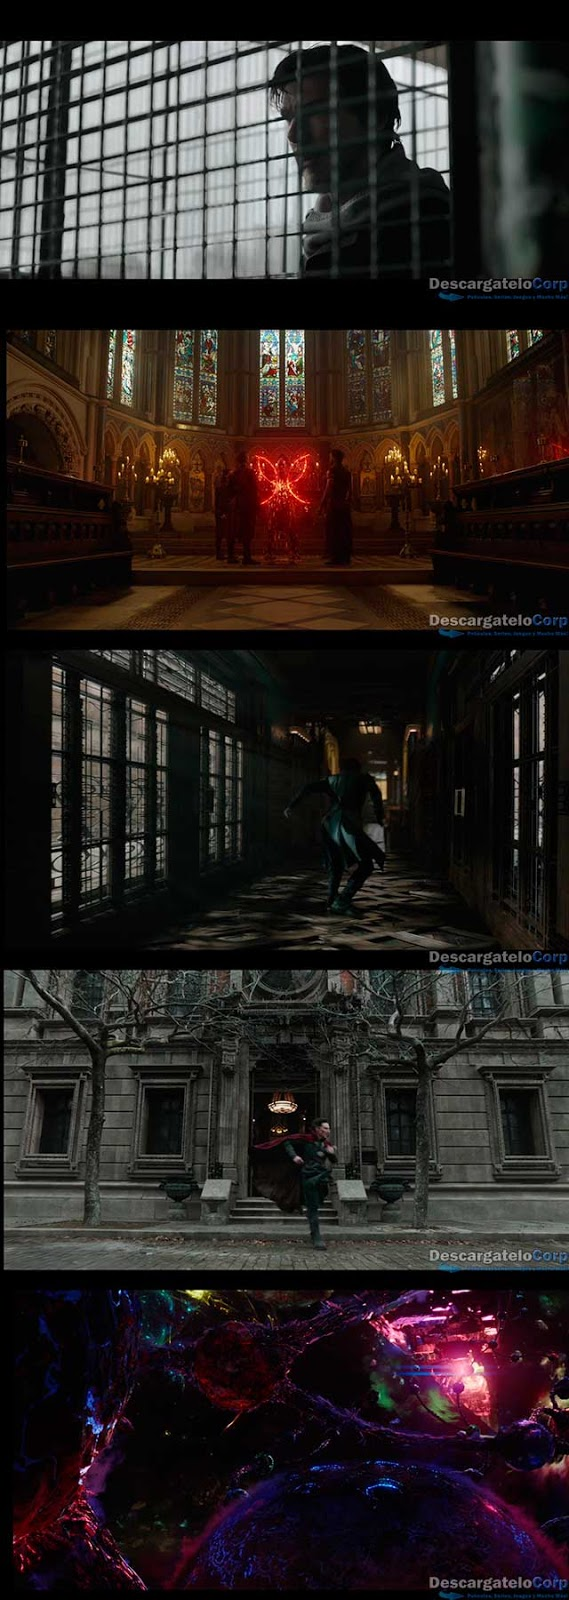 Doctor Strange Hechicero Supremo (2016) IMAX Edition HD 1080p Español Latino